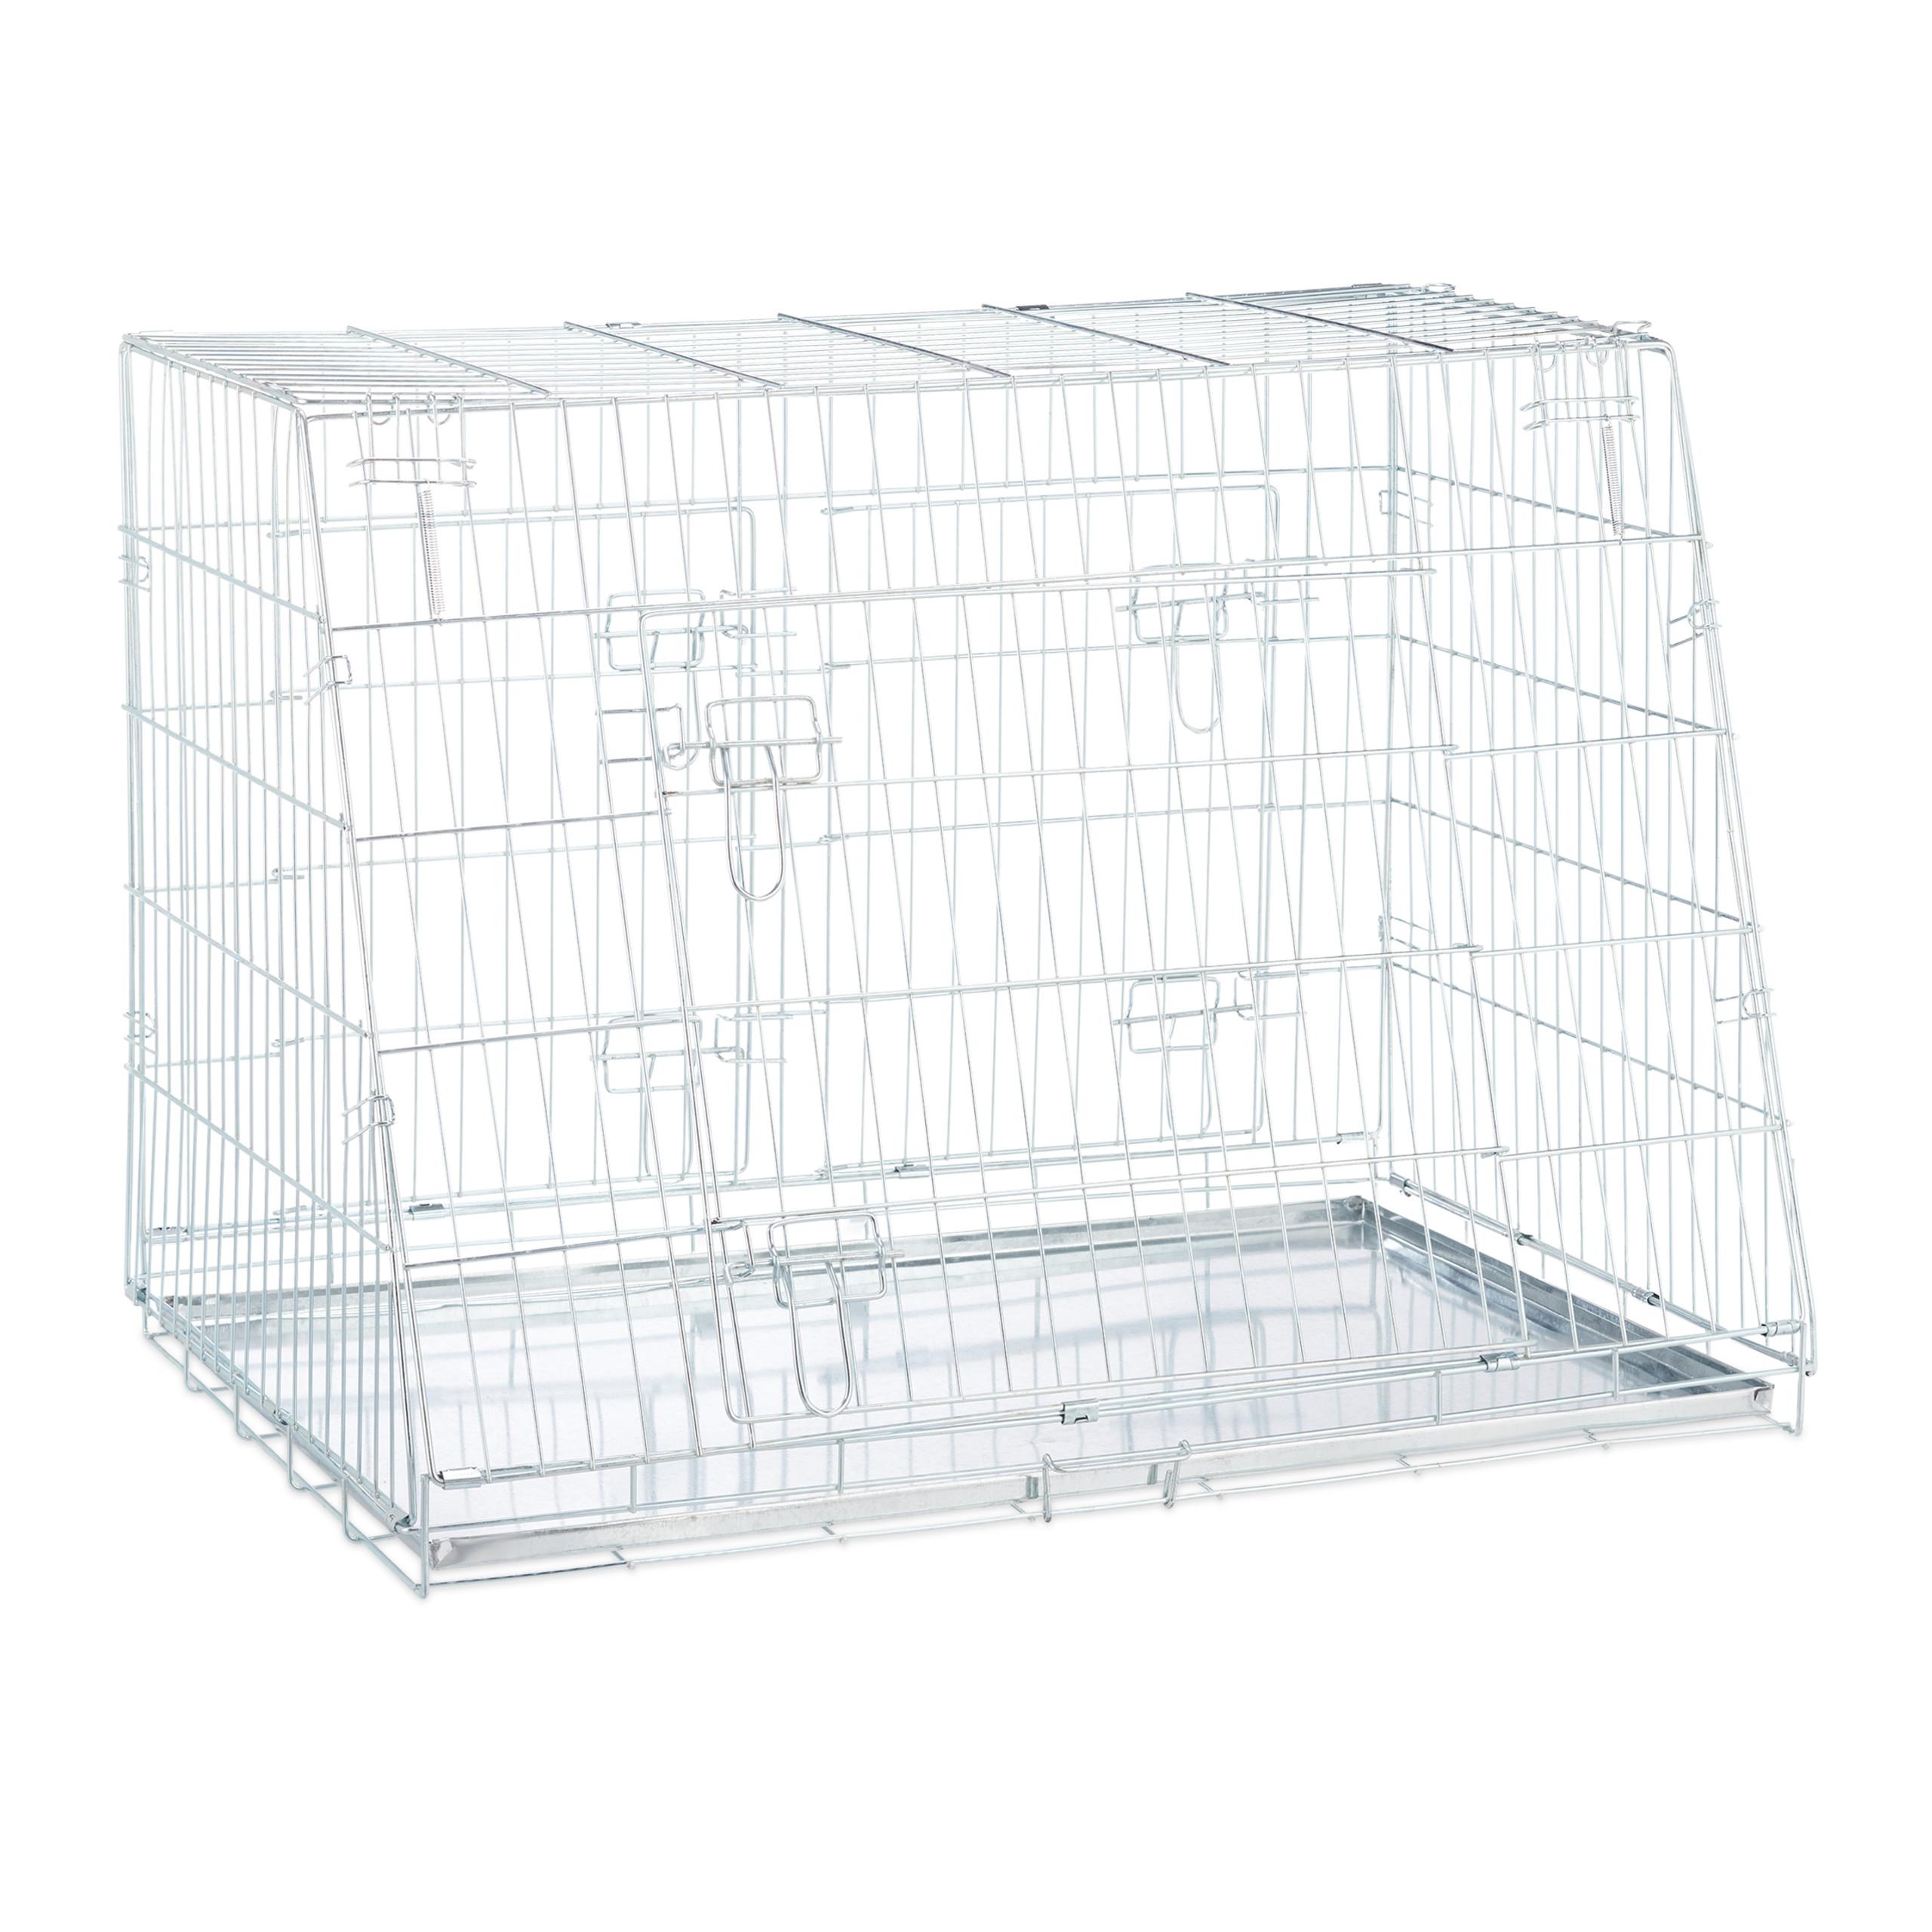 Hondenbench-dubbel-transportbench-transportbox-draadkooi-hond-L-XL-opvouwbaar miniatuur 5